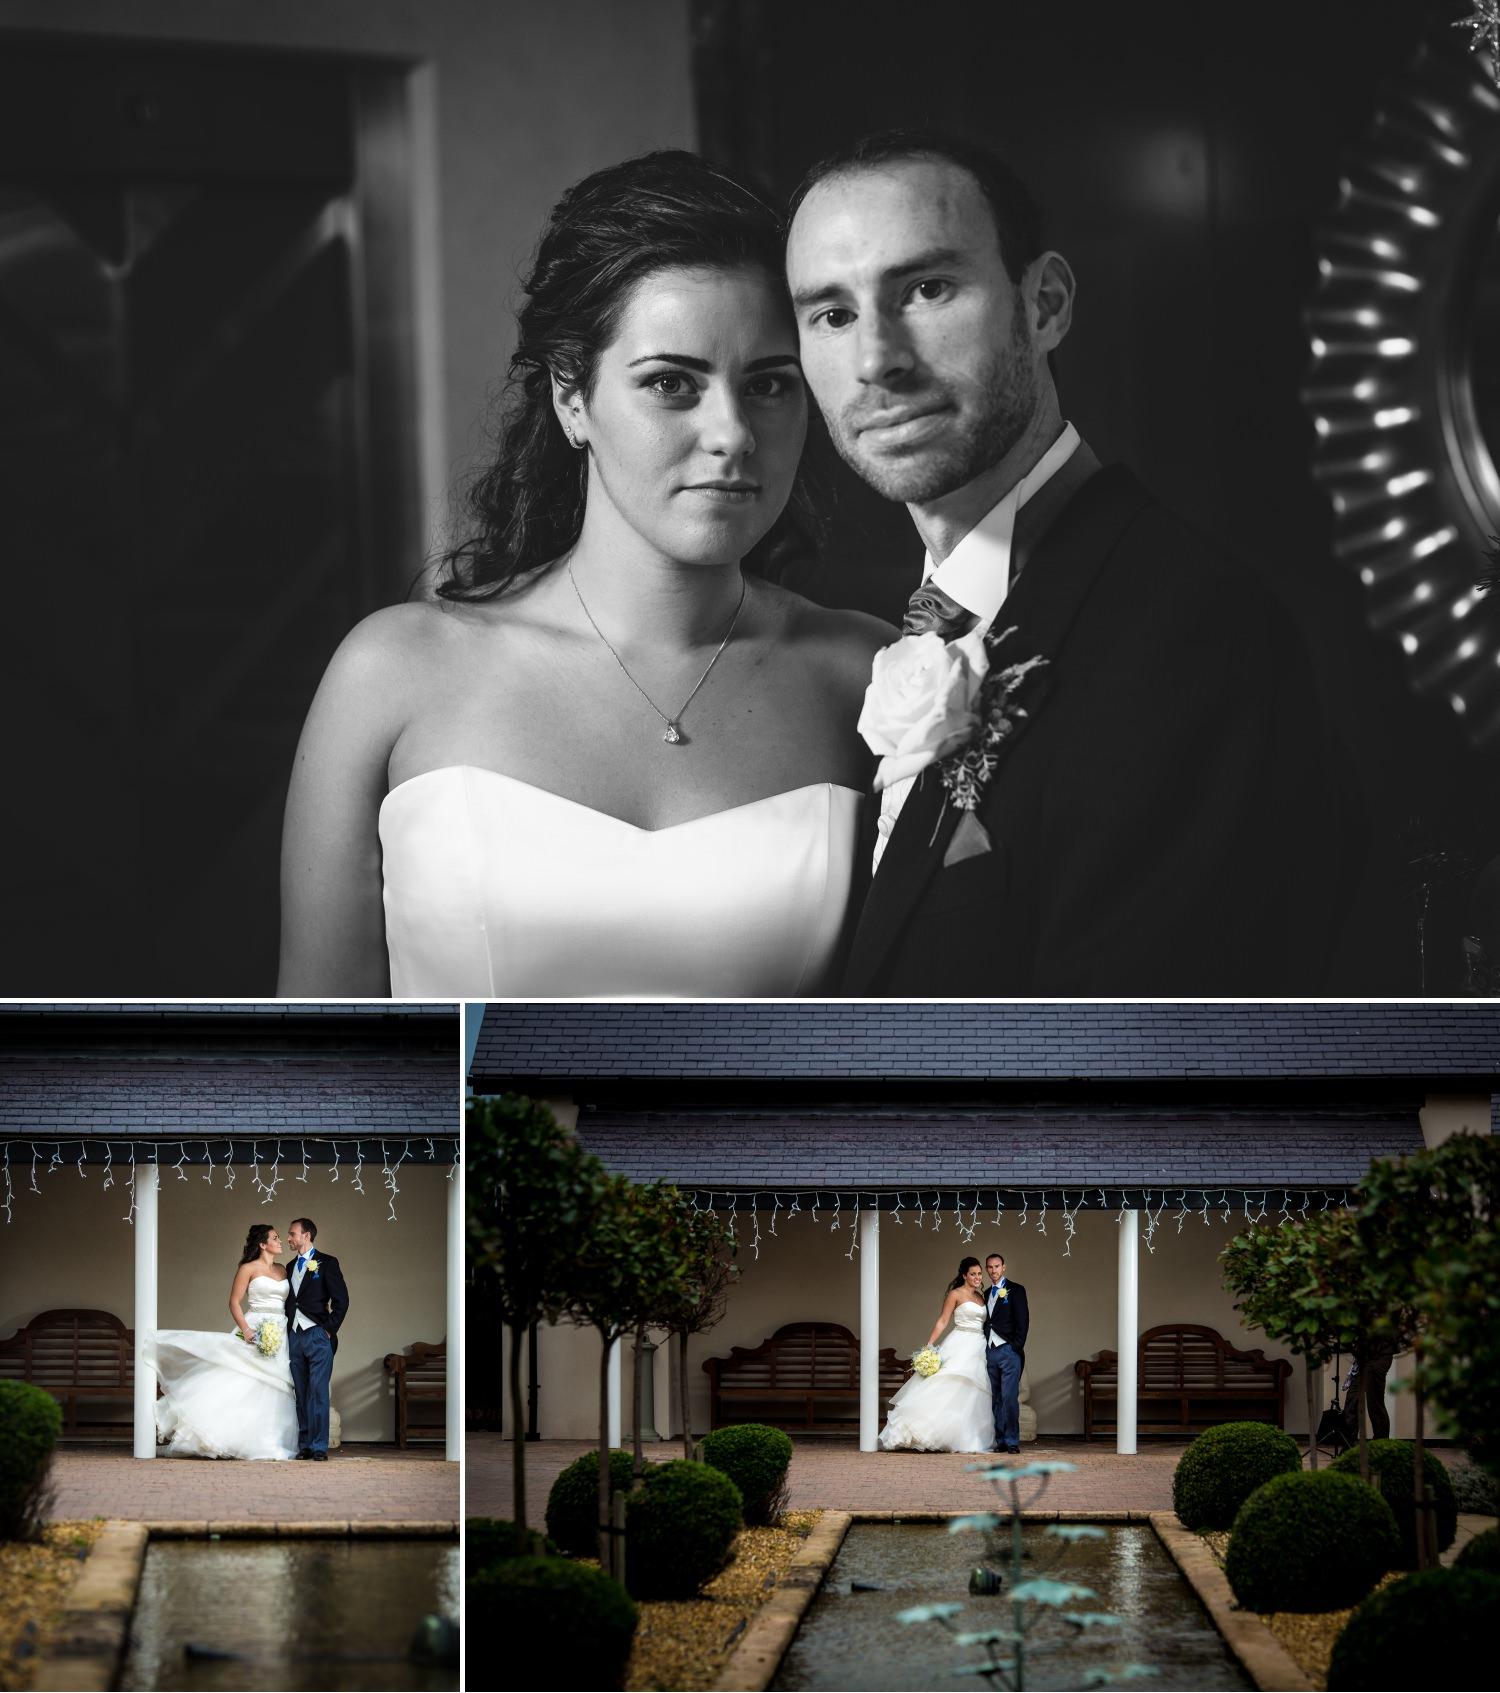 Wedding photography portrait photographs at the quay hotel Llandudno North Wales